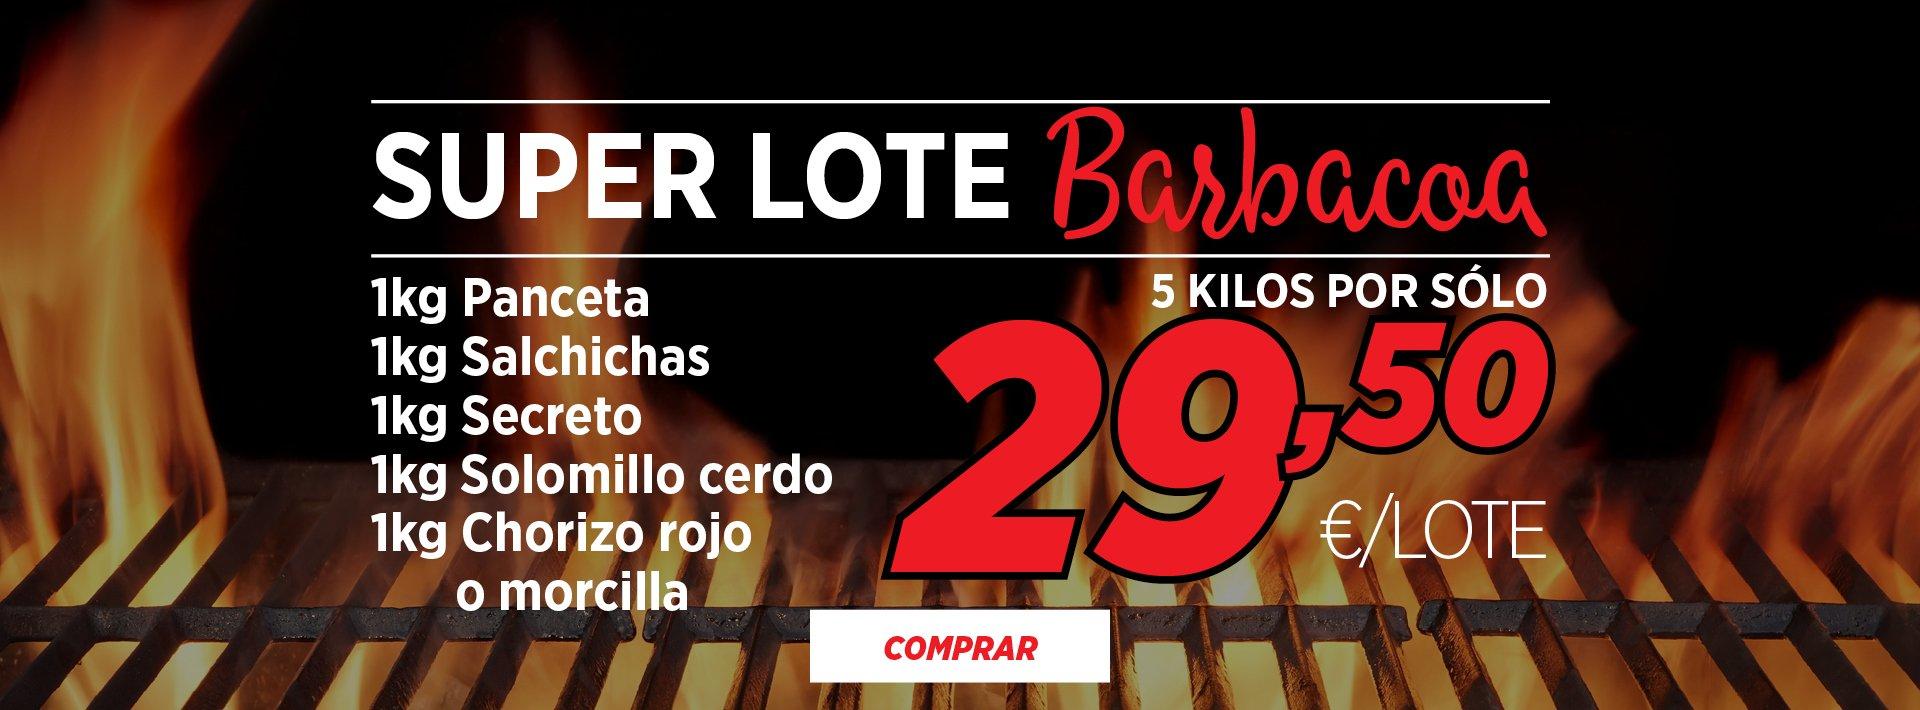 super-lote-barbacoa-2950-banner